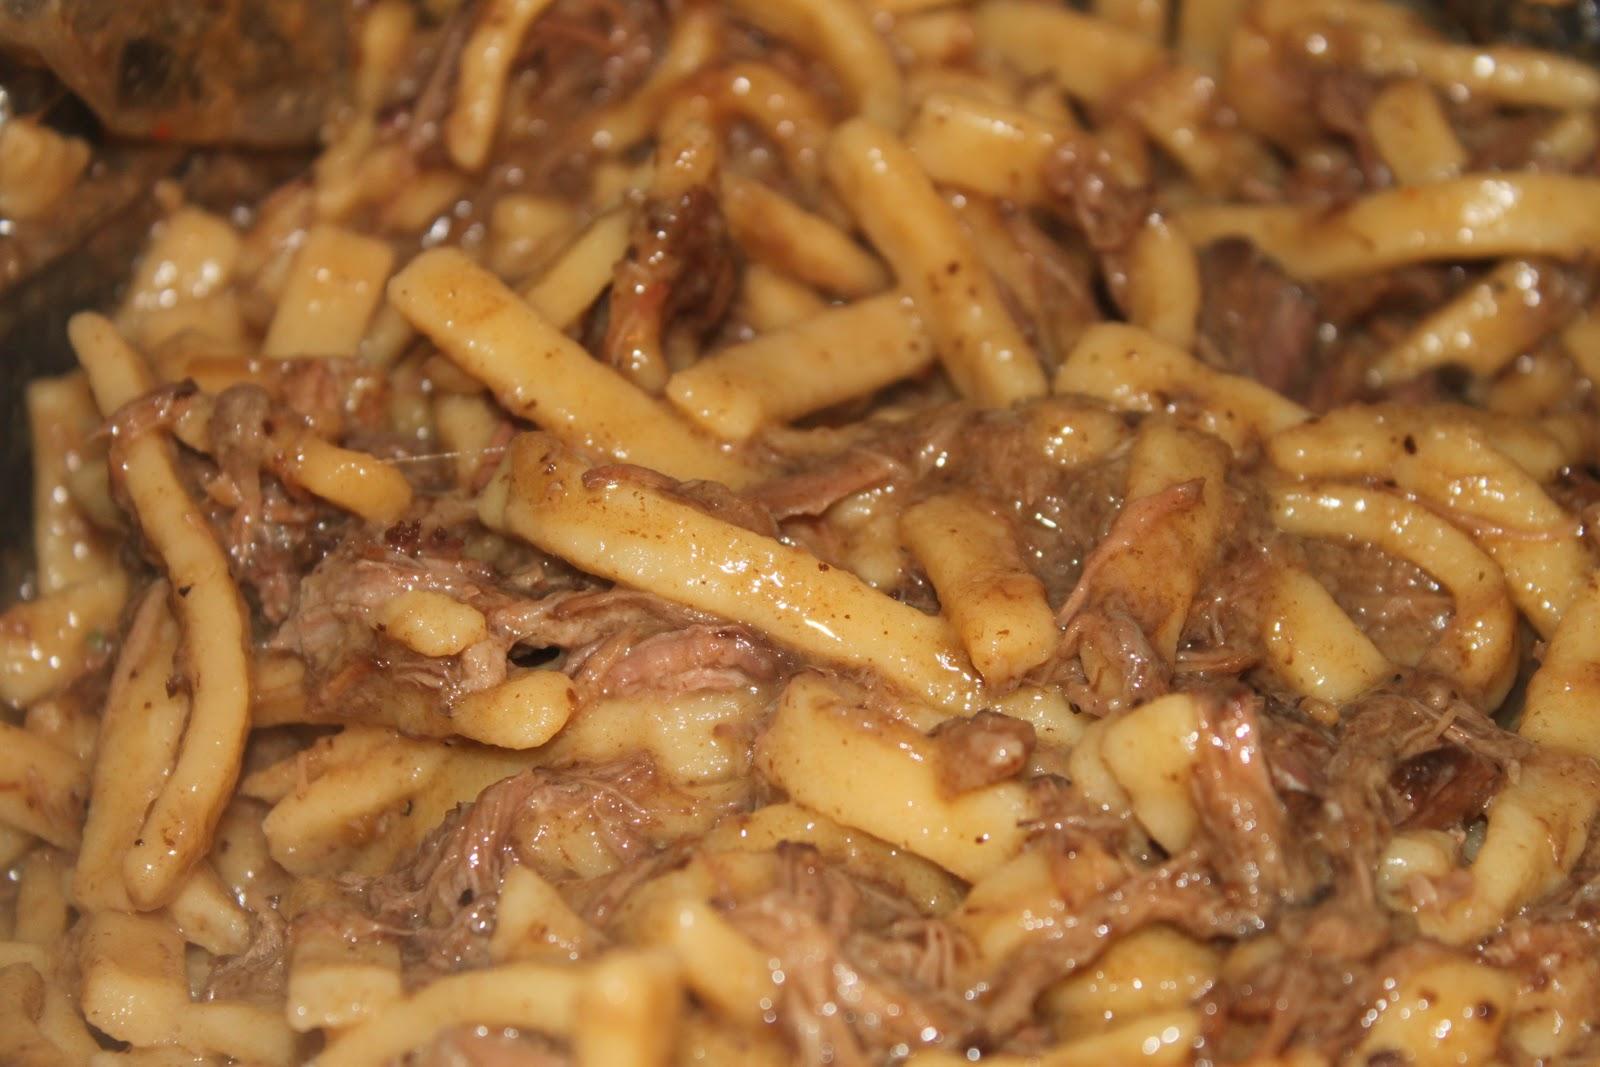 Serve over mashed potatoes